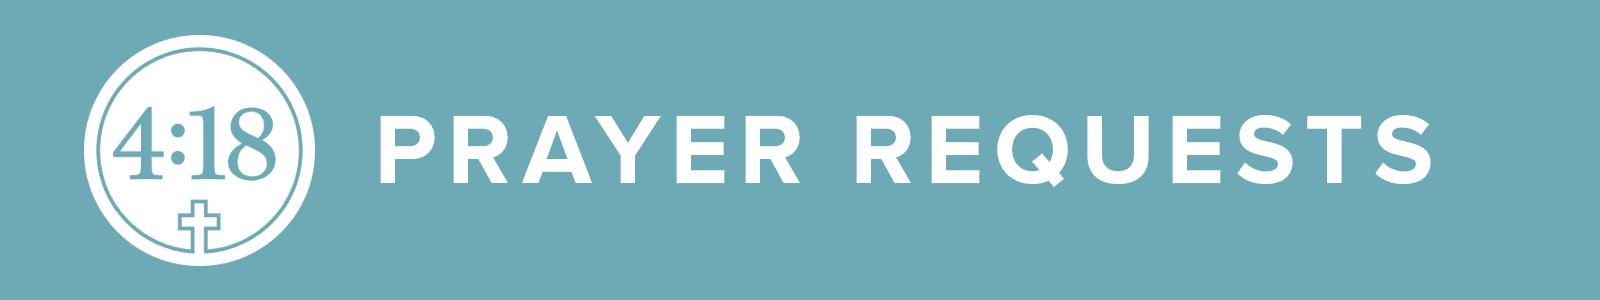 prayer requests app